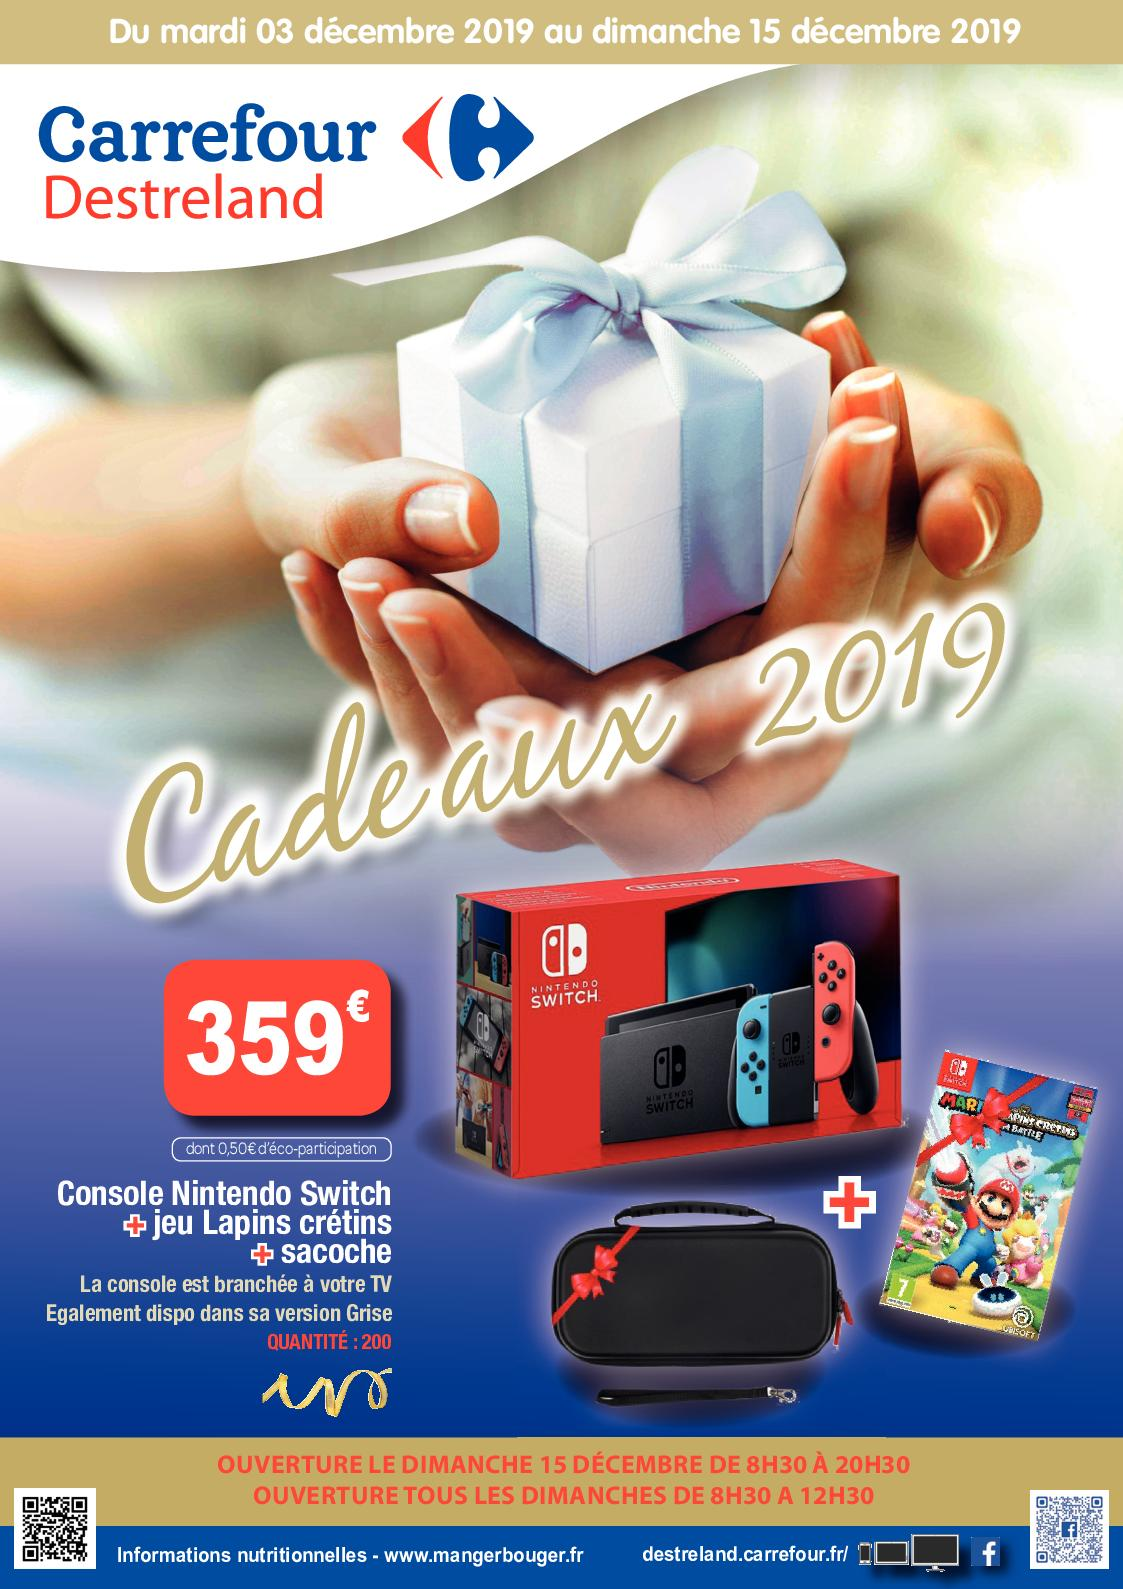 Calaméo 20191203 Carrefour Destreland Catalogue Cadeaux